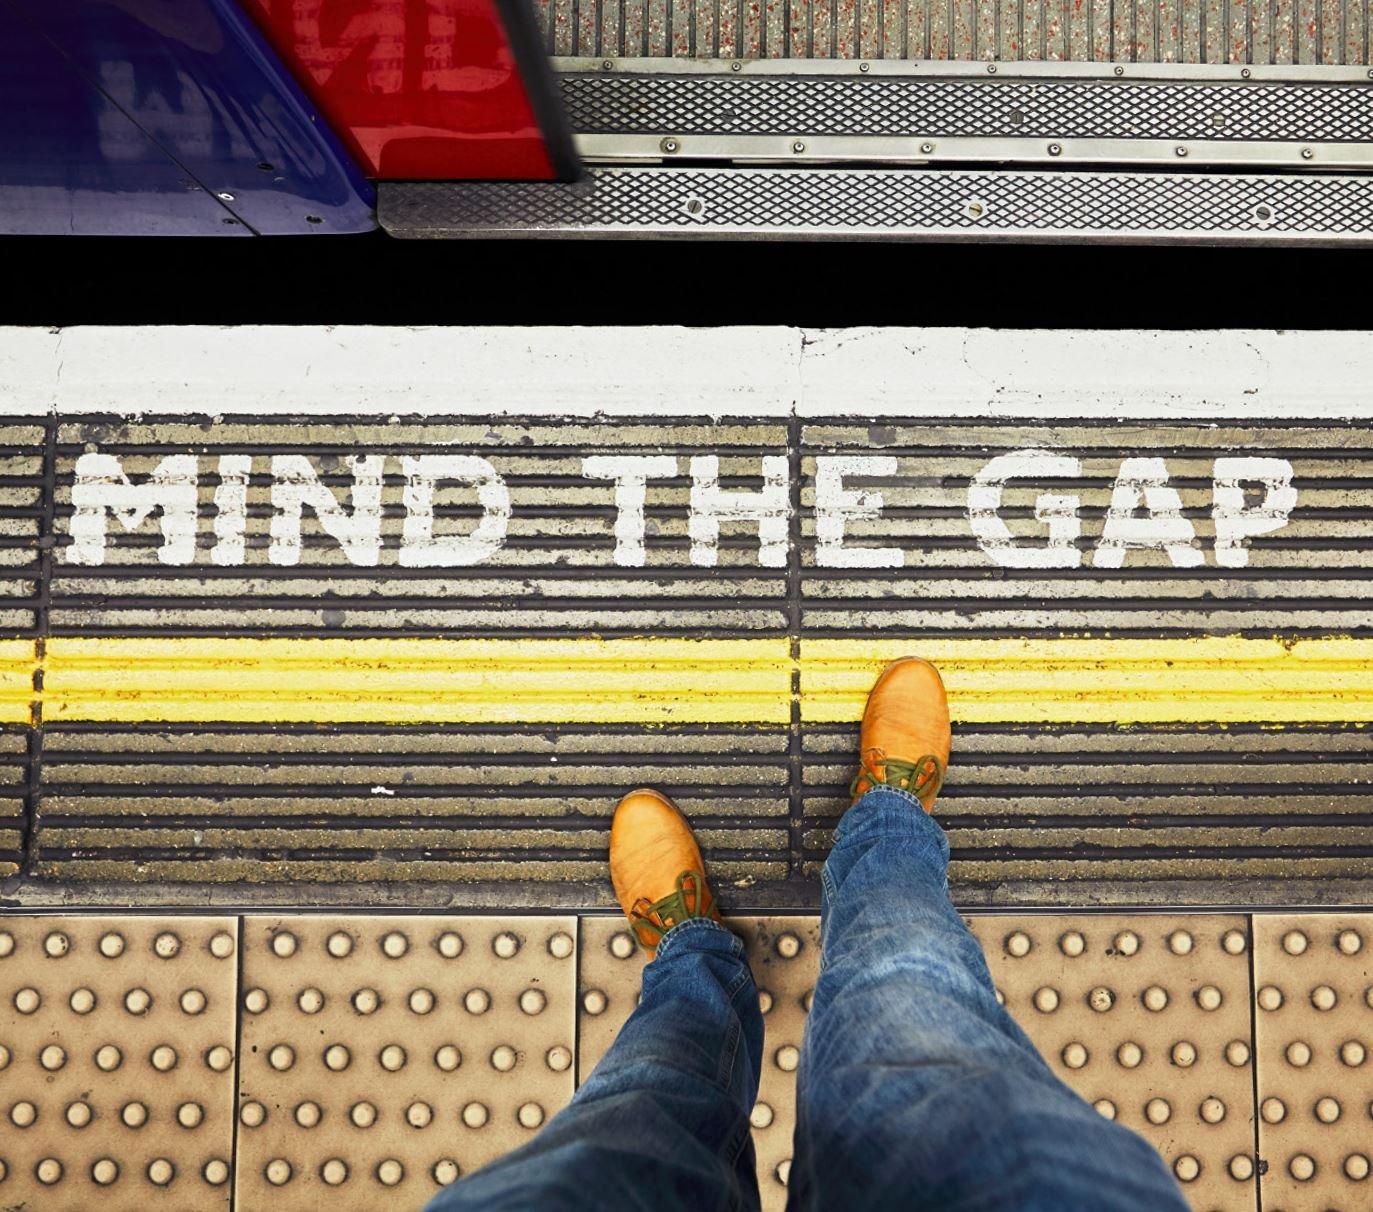 mind_the_gap_snip_image